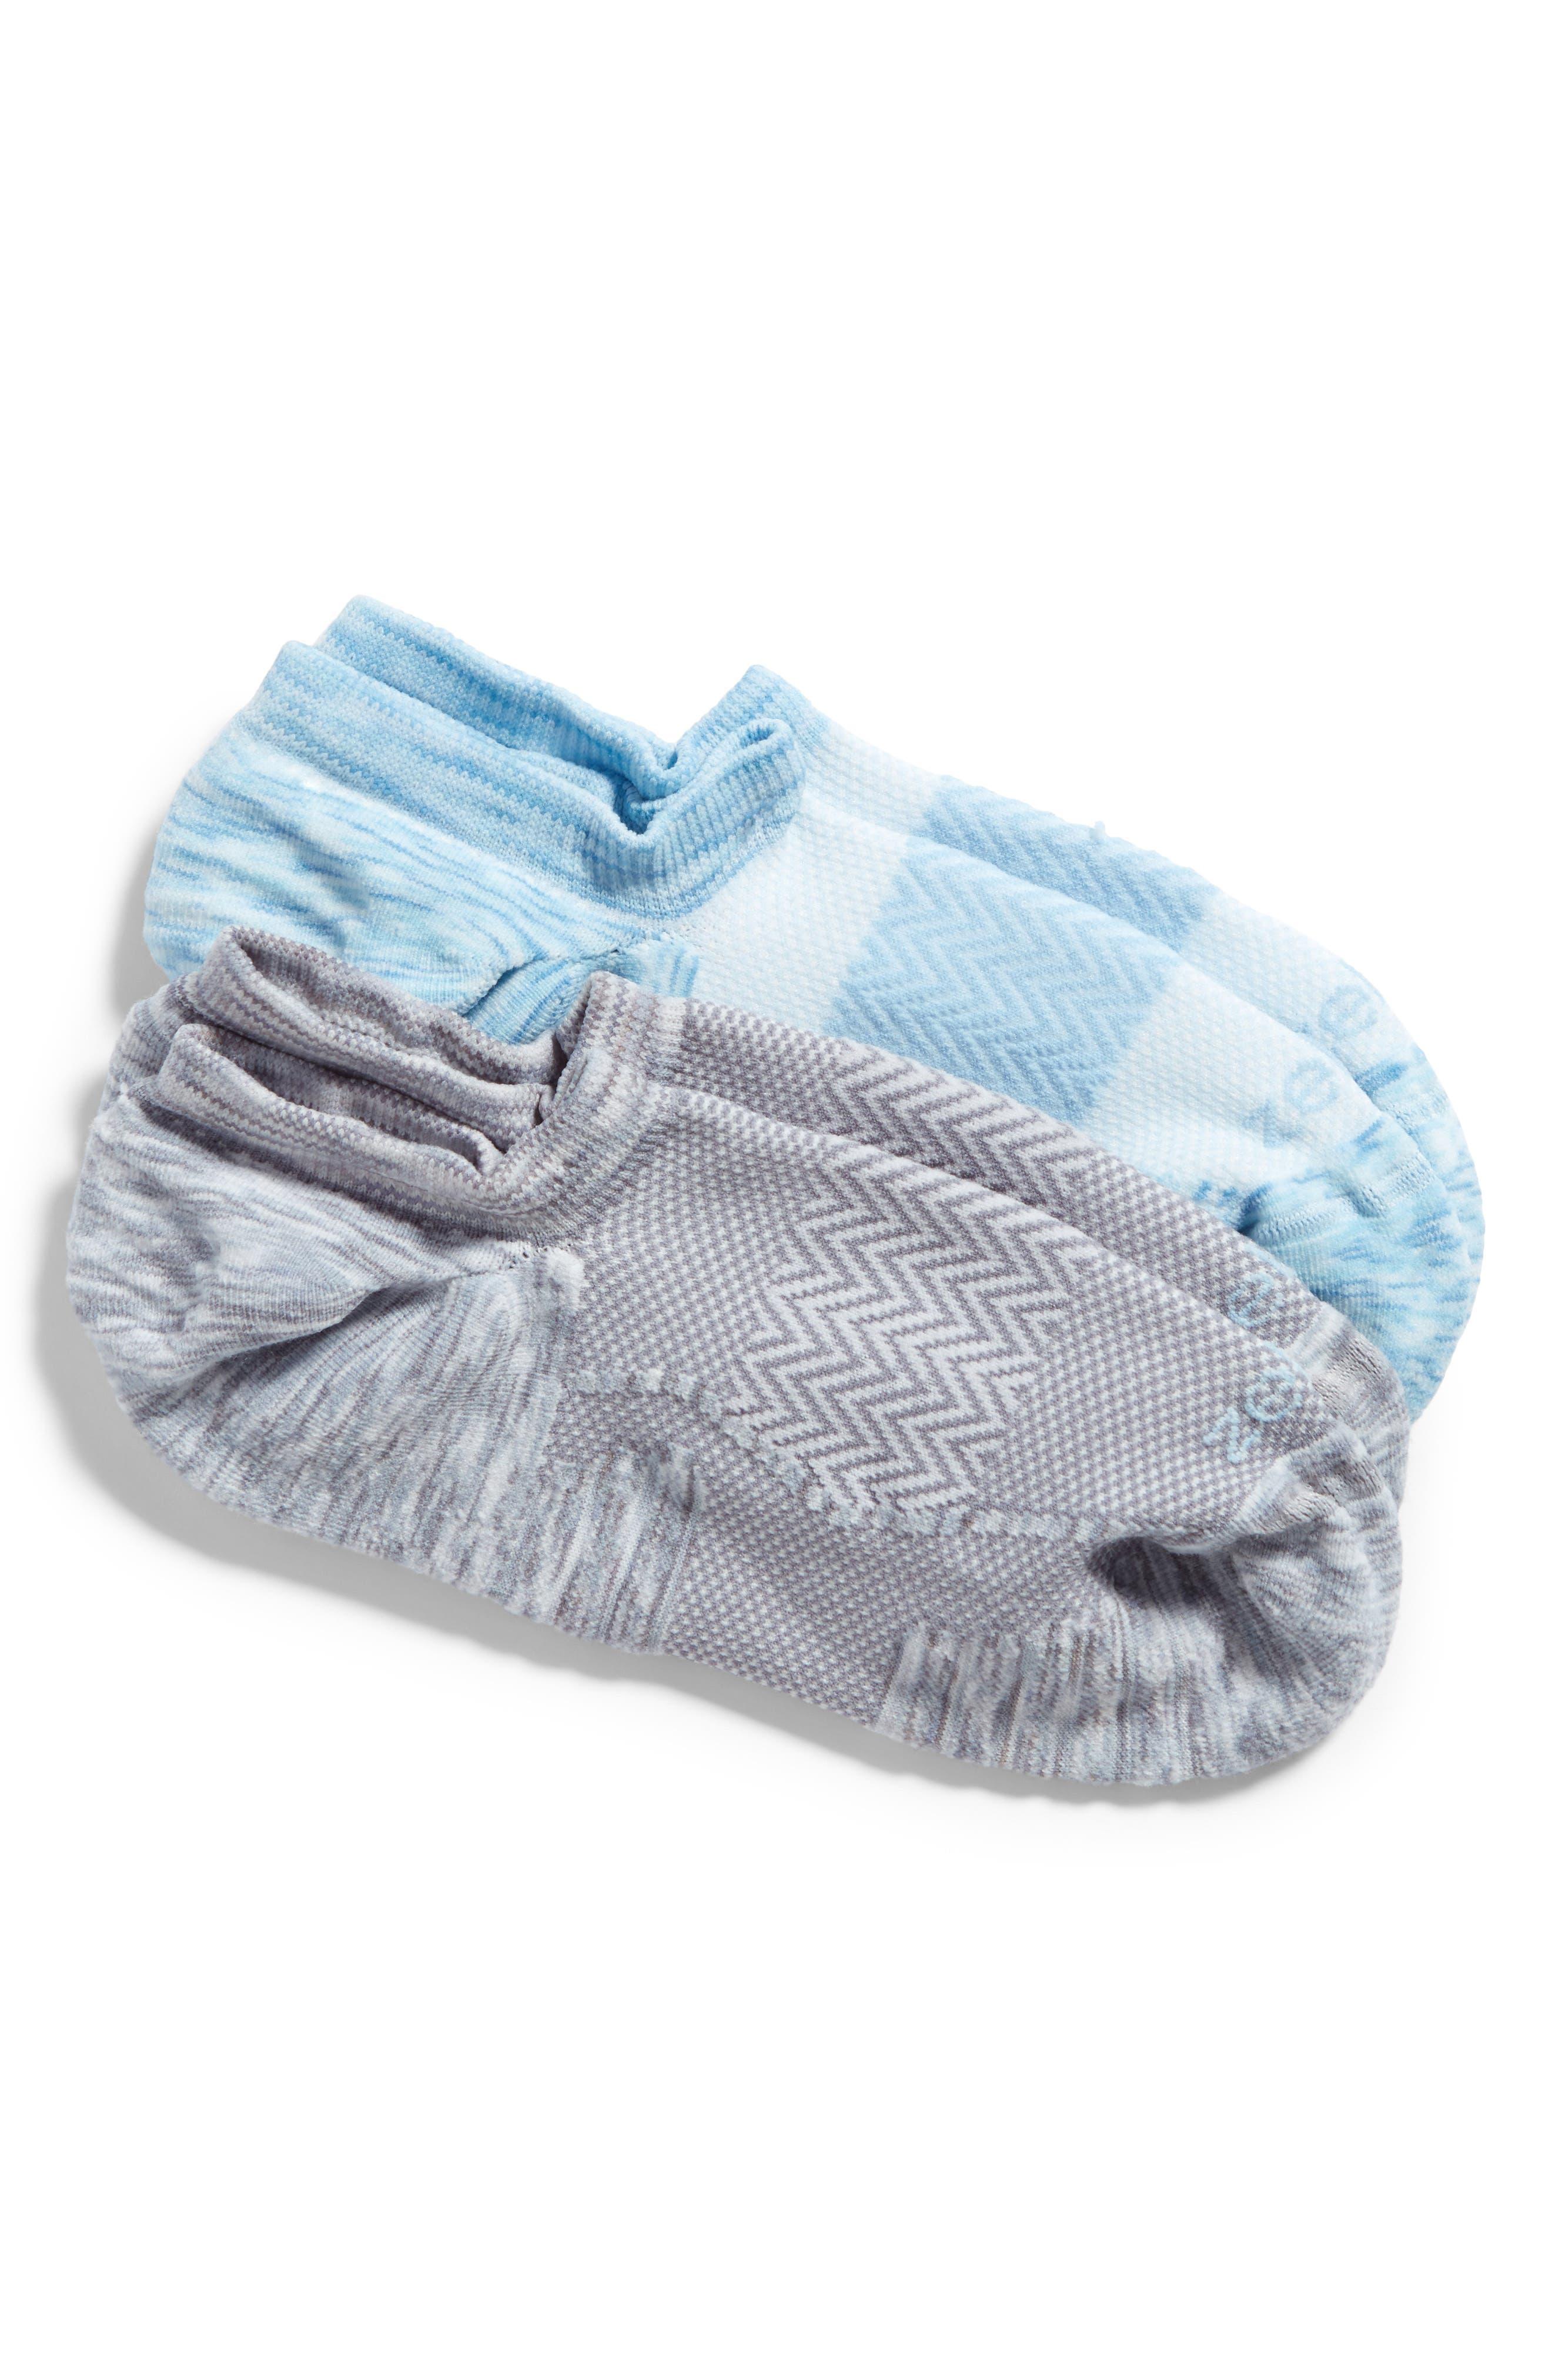 2-Pack Cushioned Low-Cut Running Socks,                             Main thumbnail 1, color,                             Grey Graphite